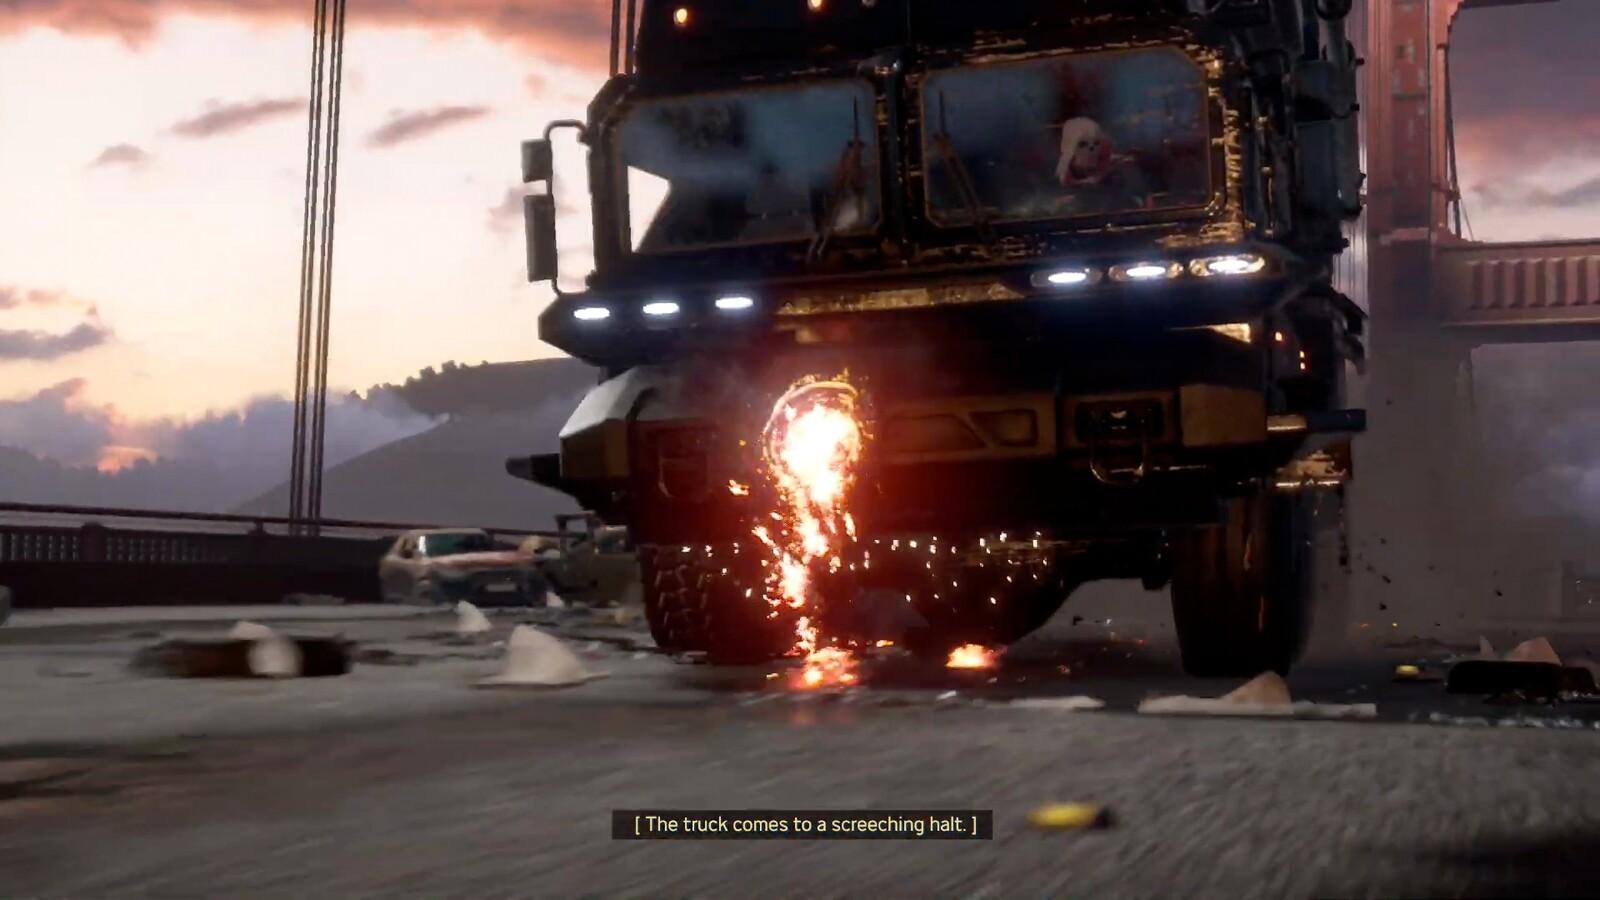 Taskmaster Truck: Modeling / Texturing, Blast Hole Damage State: Modeling / Texturing